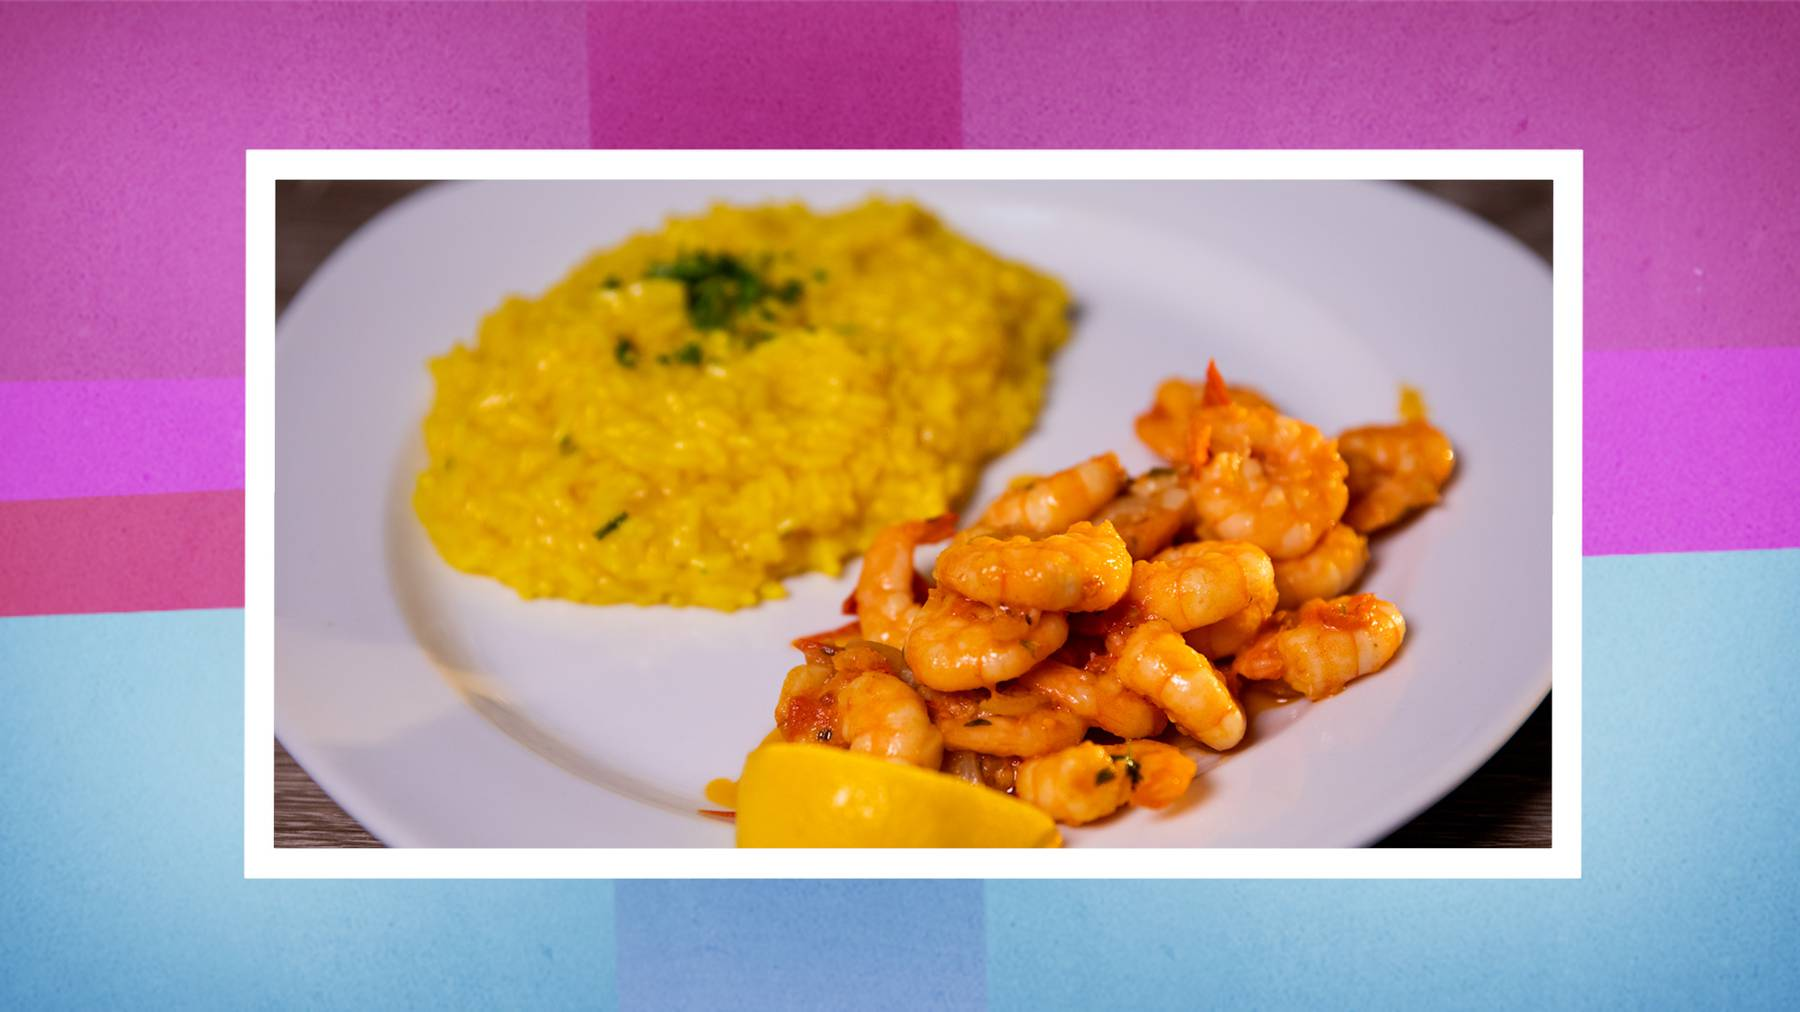 Zitronen-Chili-Shrimps mit Safran-Risotto